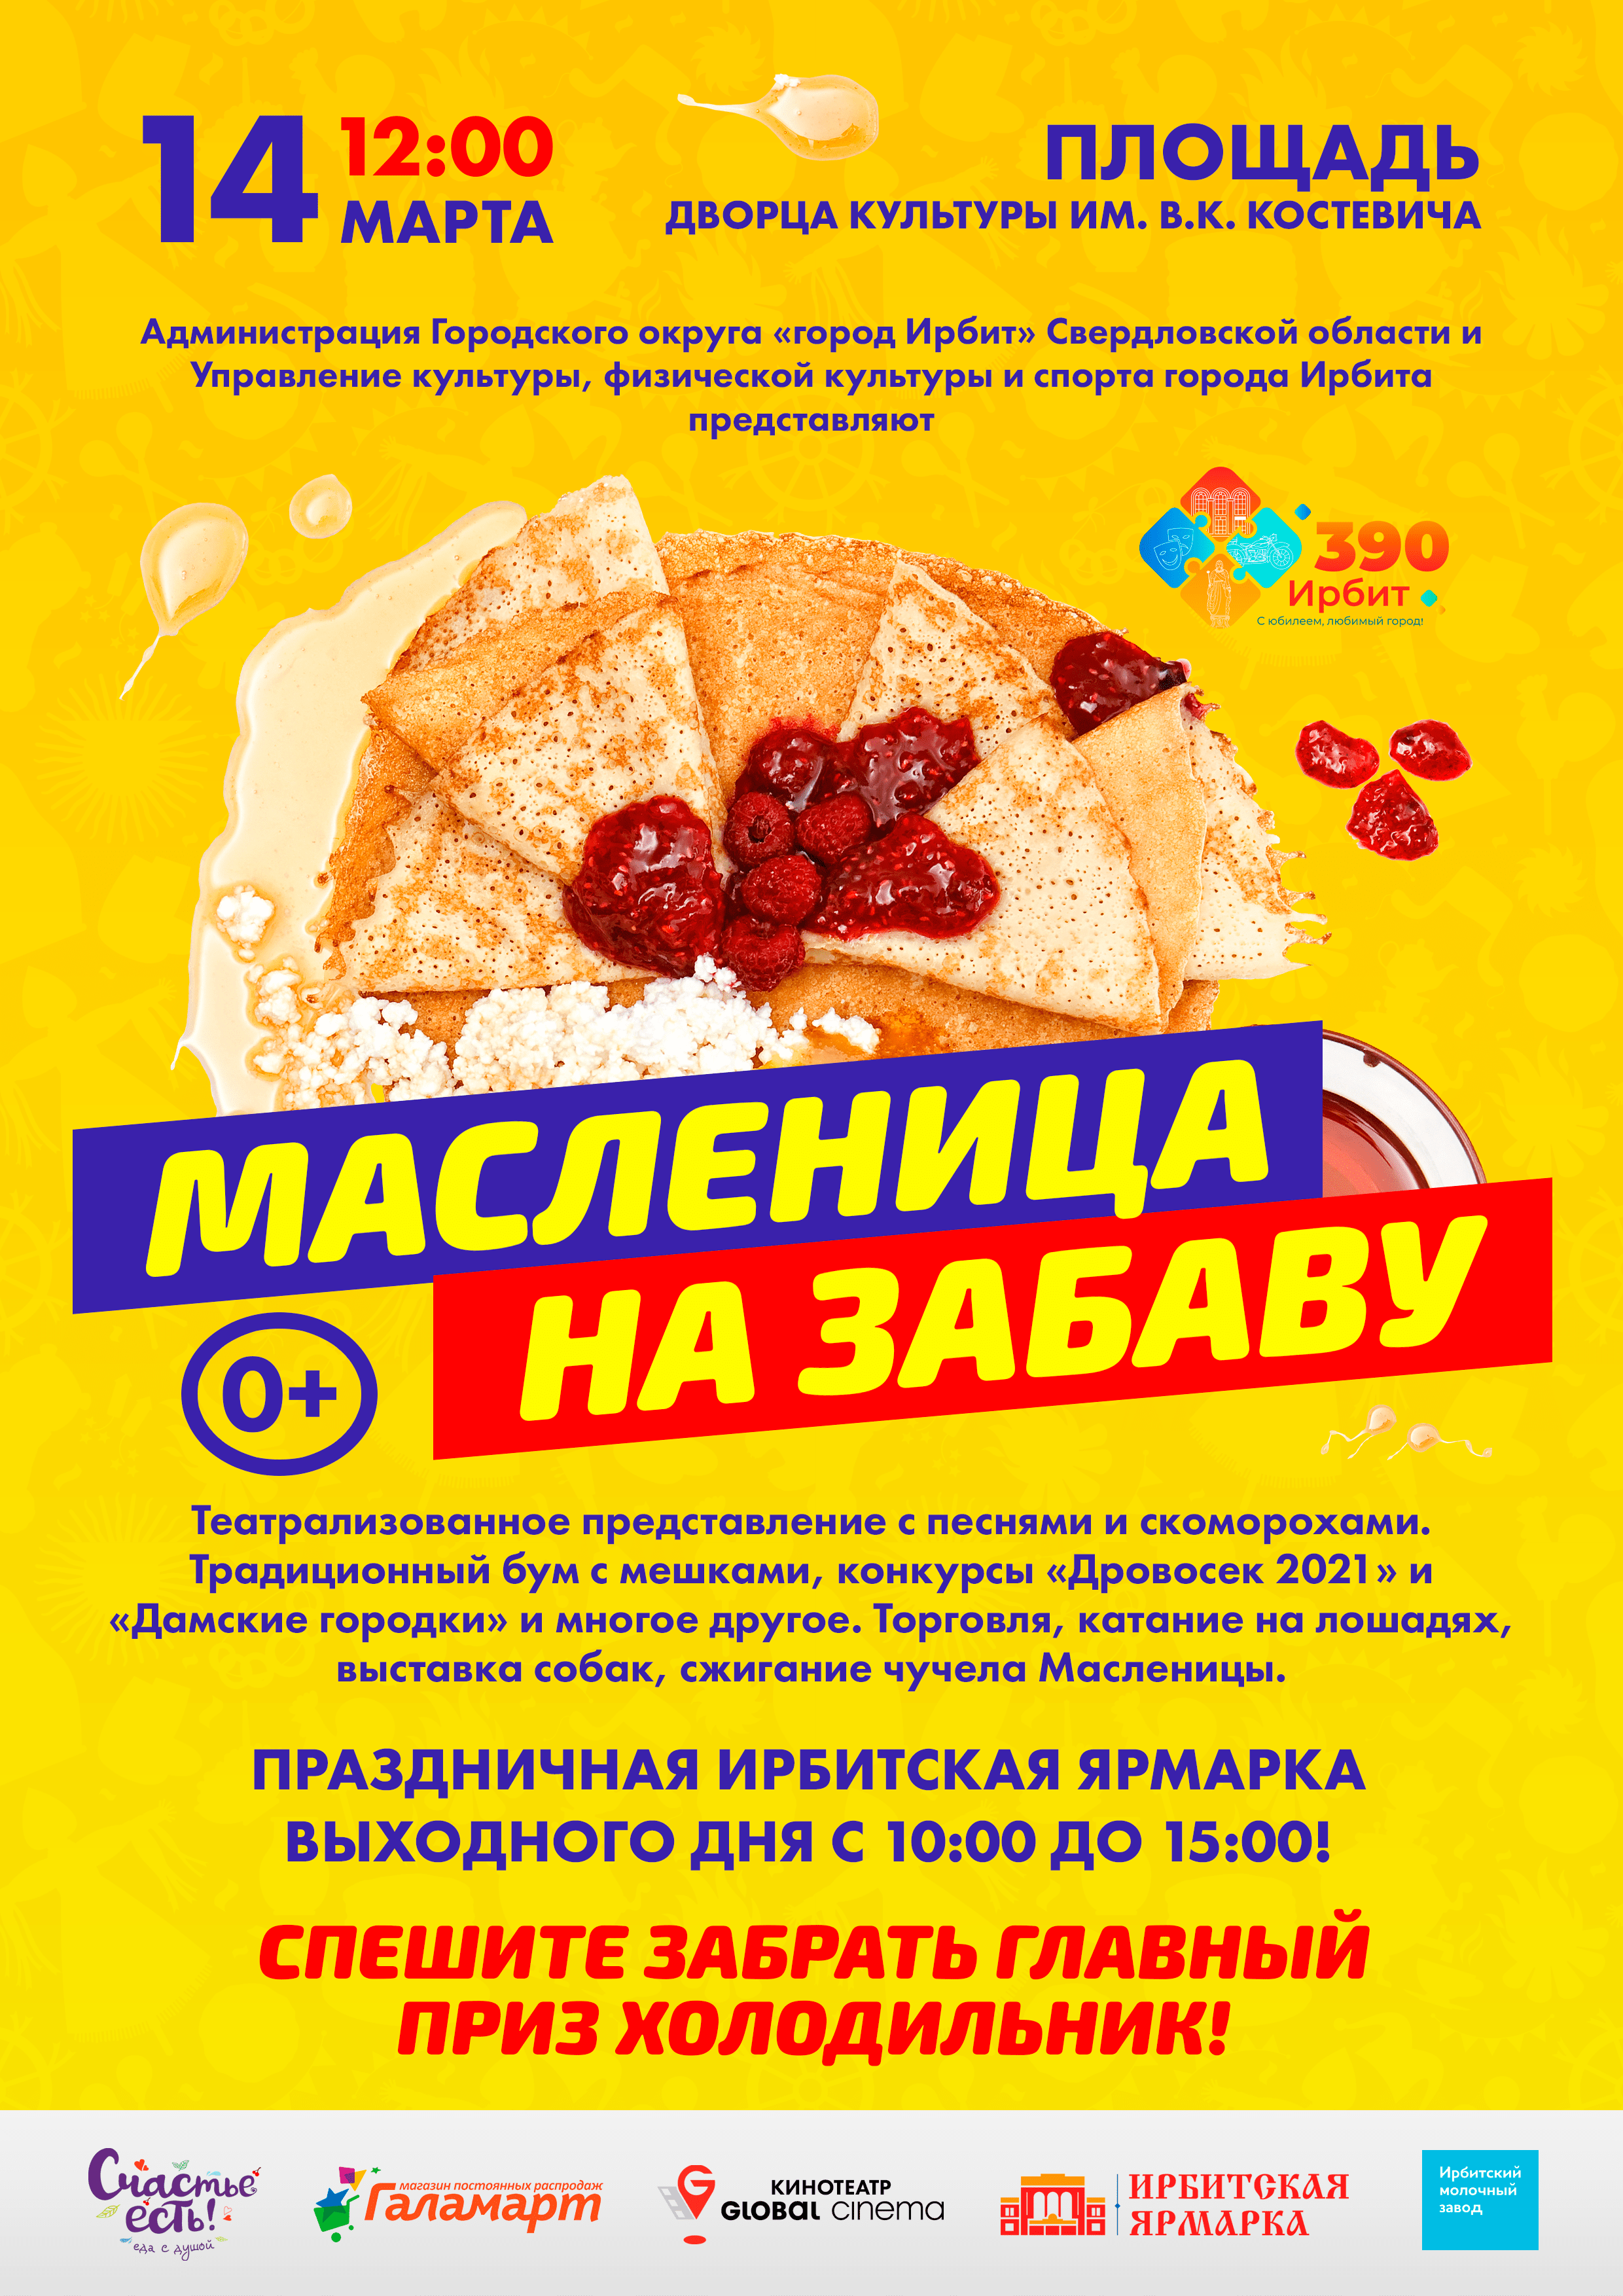 Афиша Масленица на забаву